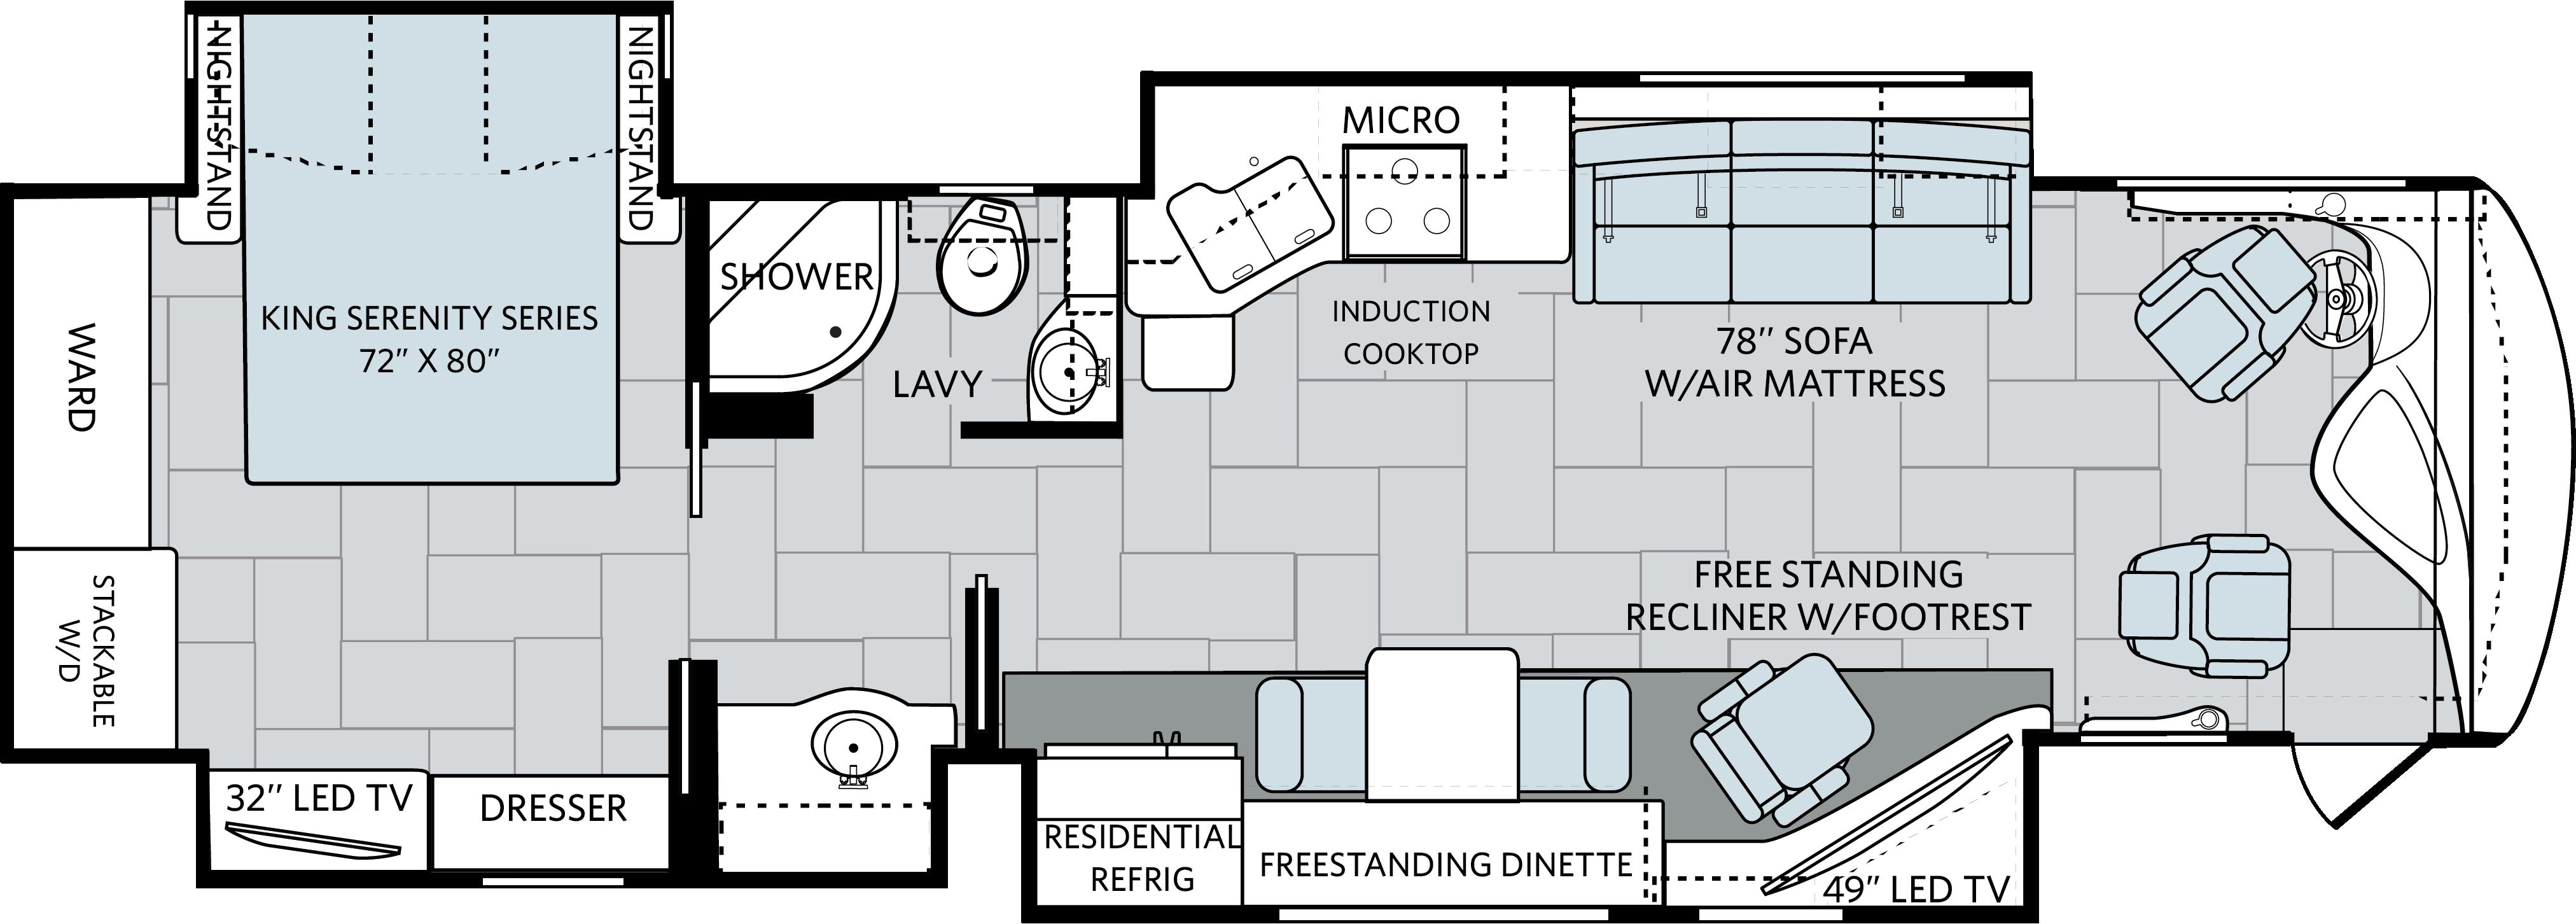 Holiday Rambler Wiring Diagrams Bath Room Simple Diagram 2005 Rv Living Navigator Class A Diesel Motorhomes Inverter